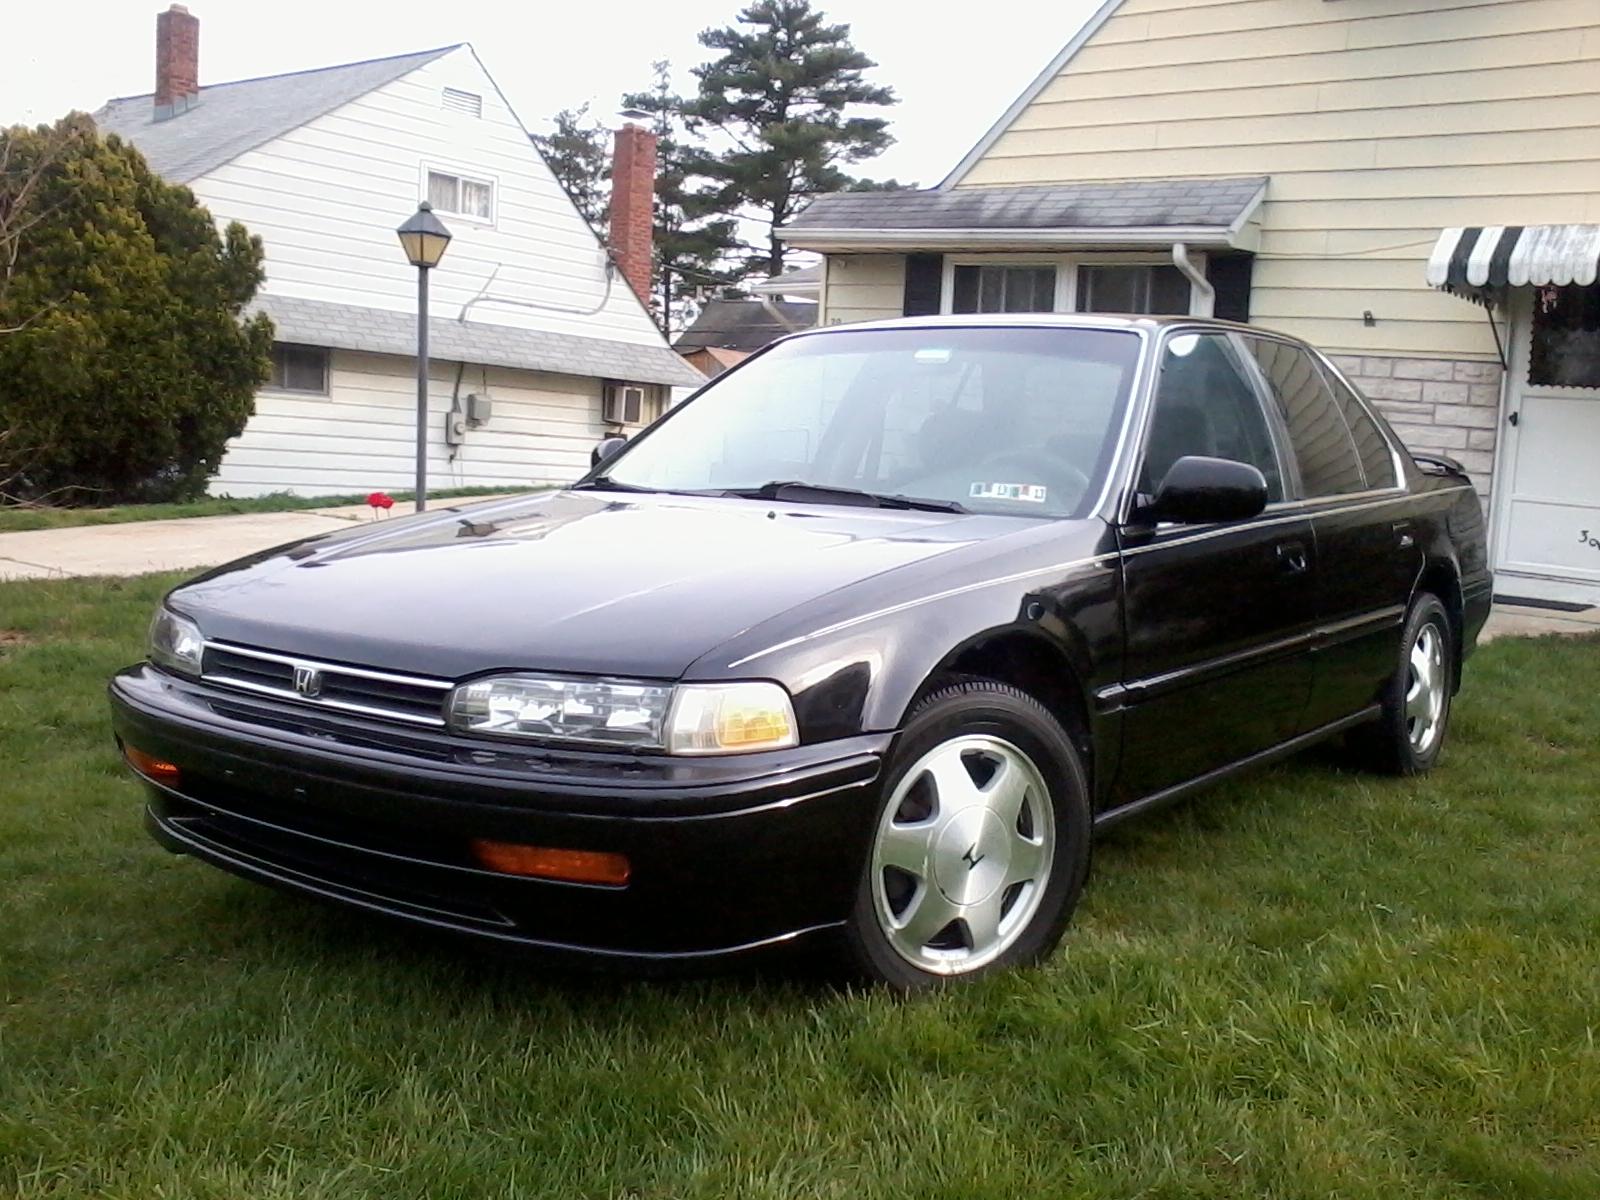 1993 Honda Accord - Pictures